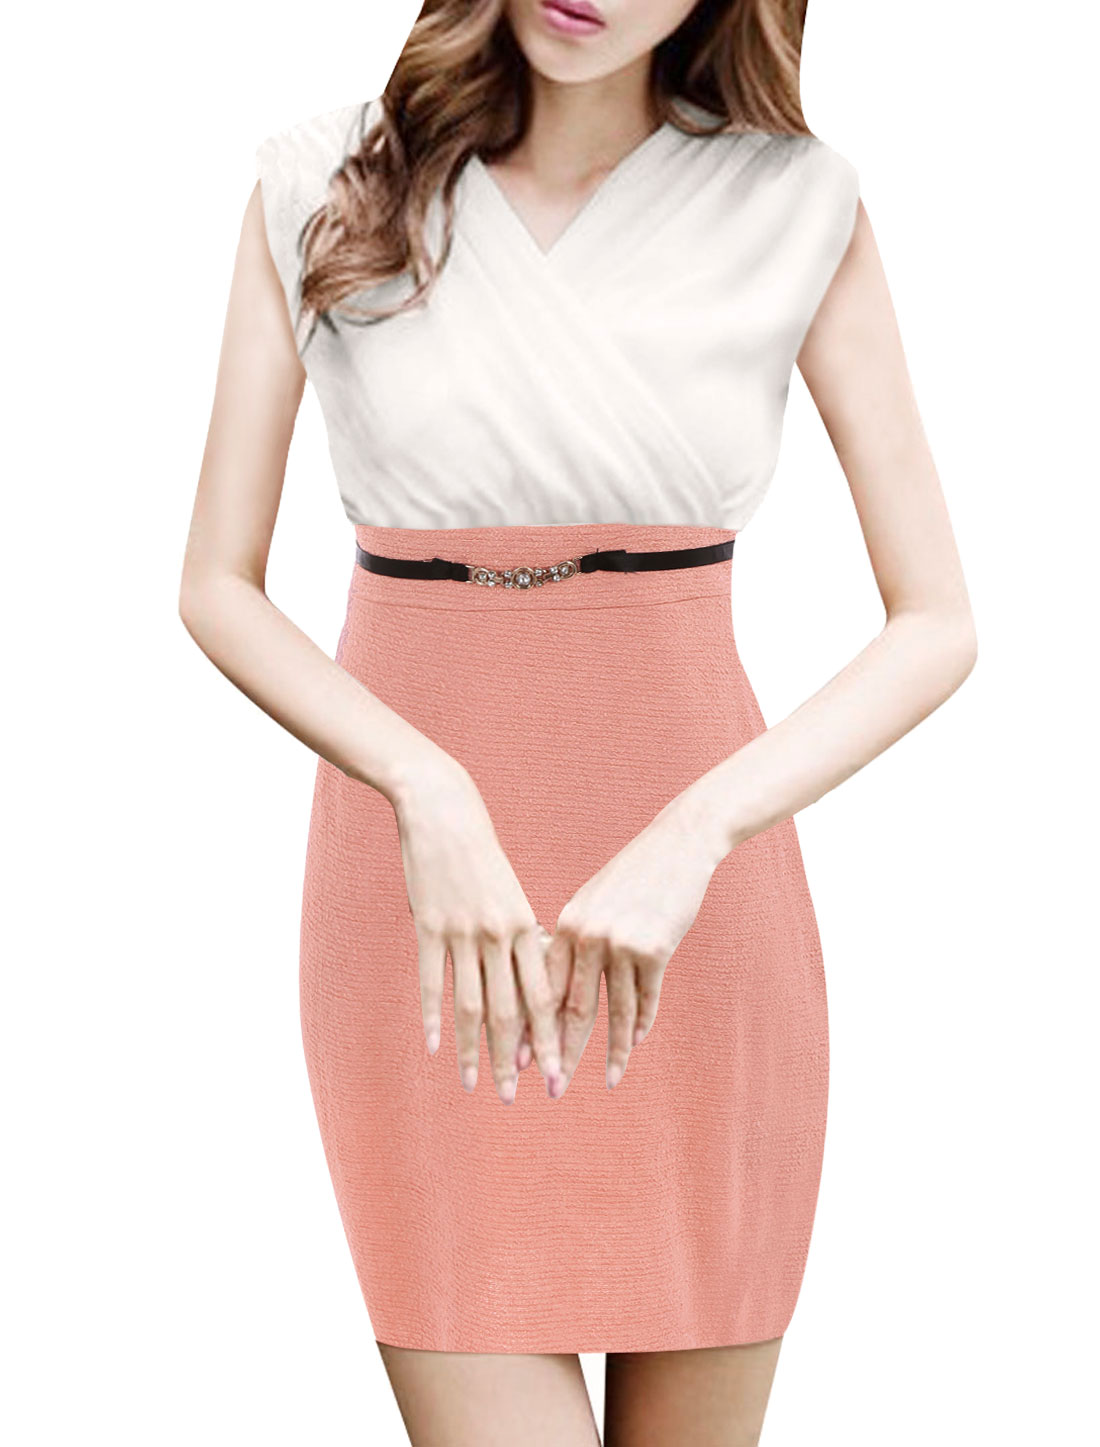 Women Double Crossover V Neck Sleeveless Belted Waist Sheath White Pink Dress XS